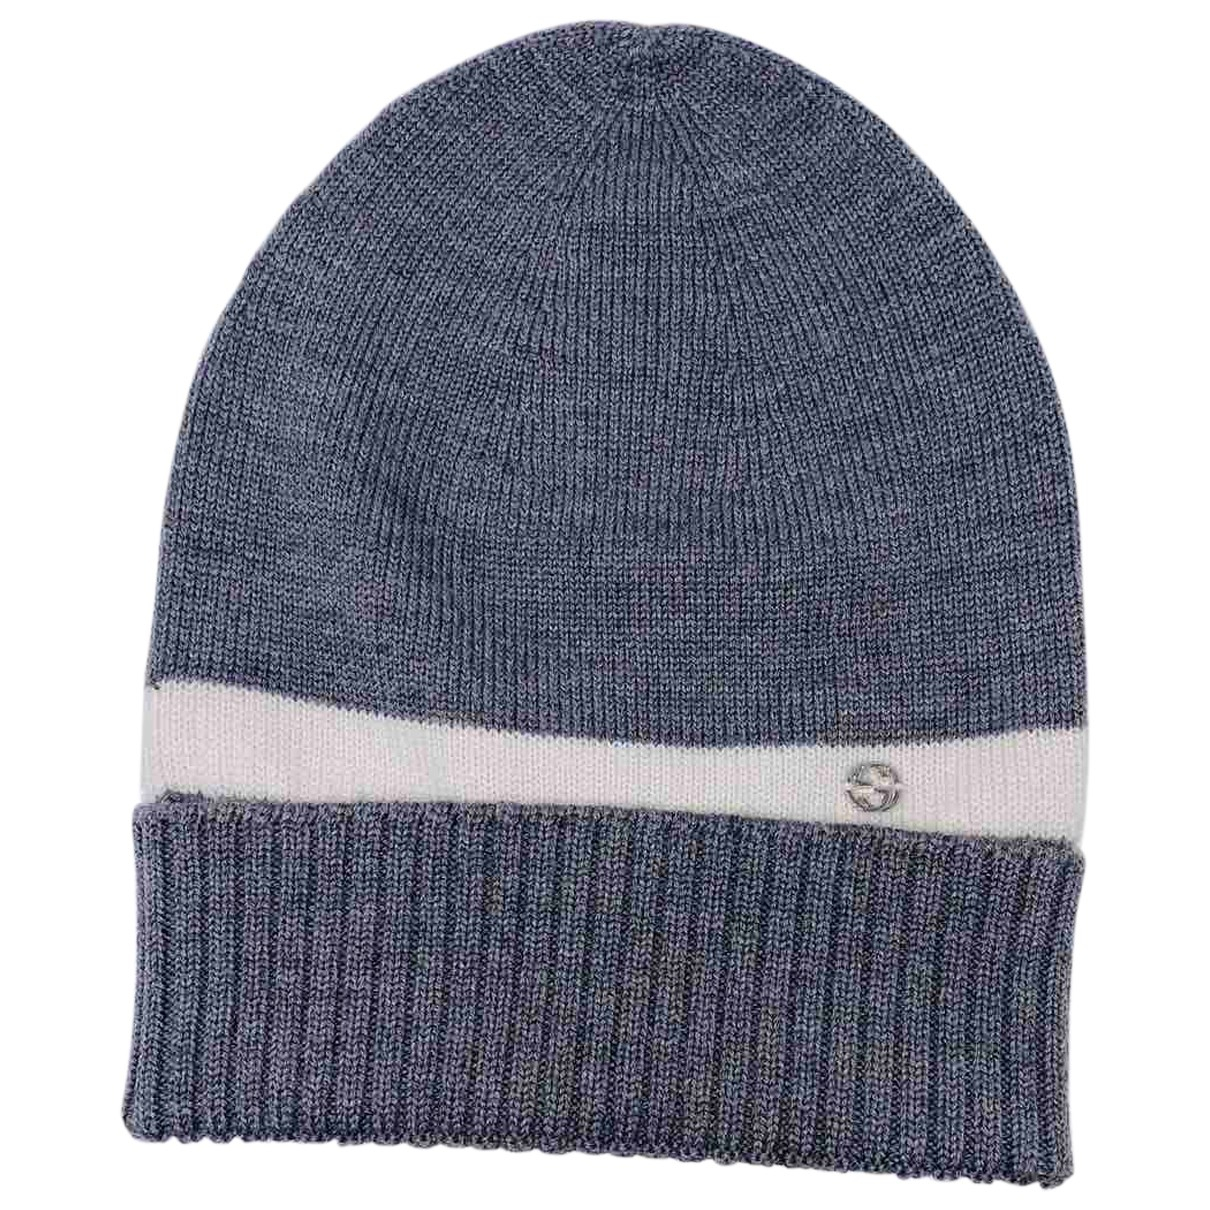 Gucci N Grey Wool hat & pull on hat for Men M International